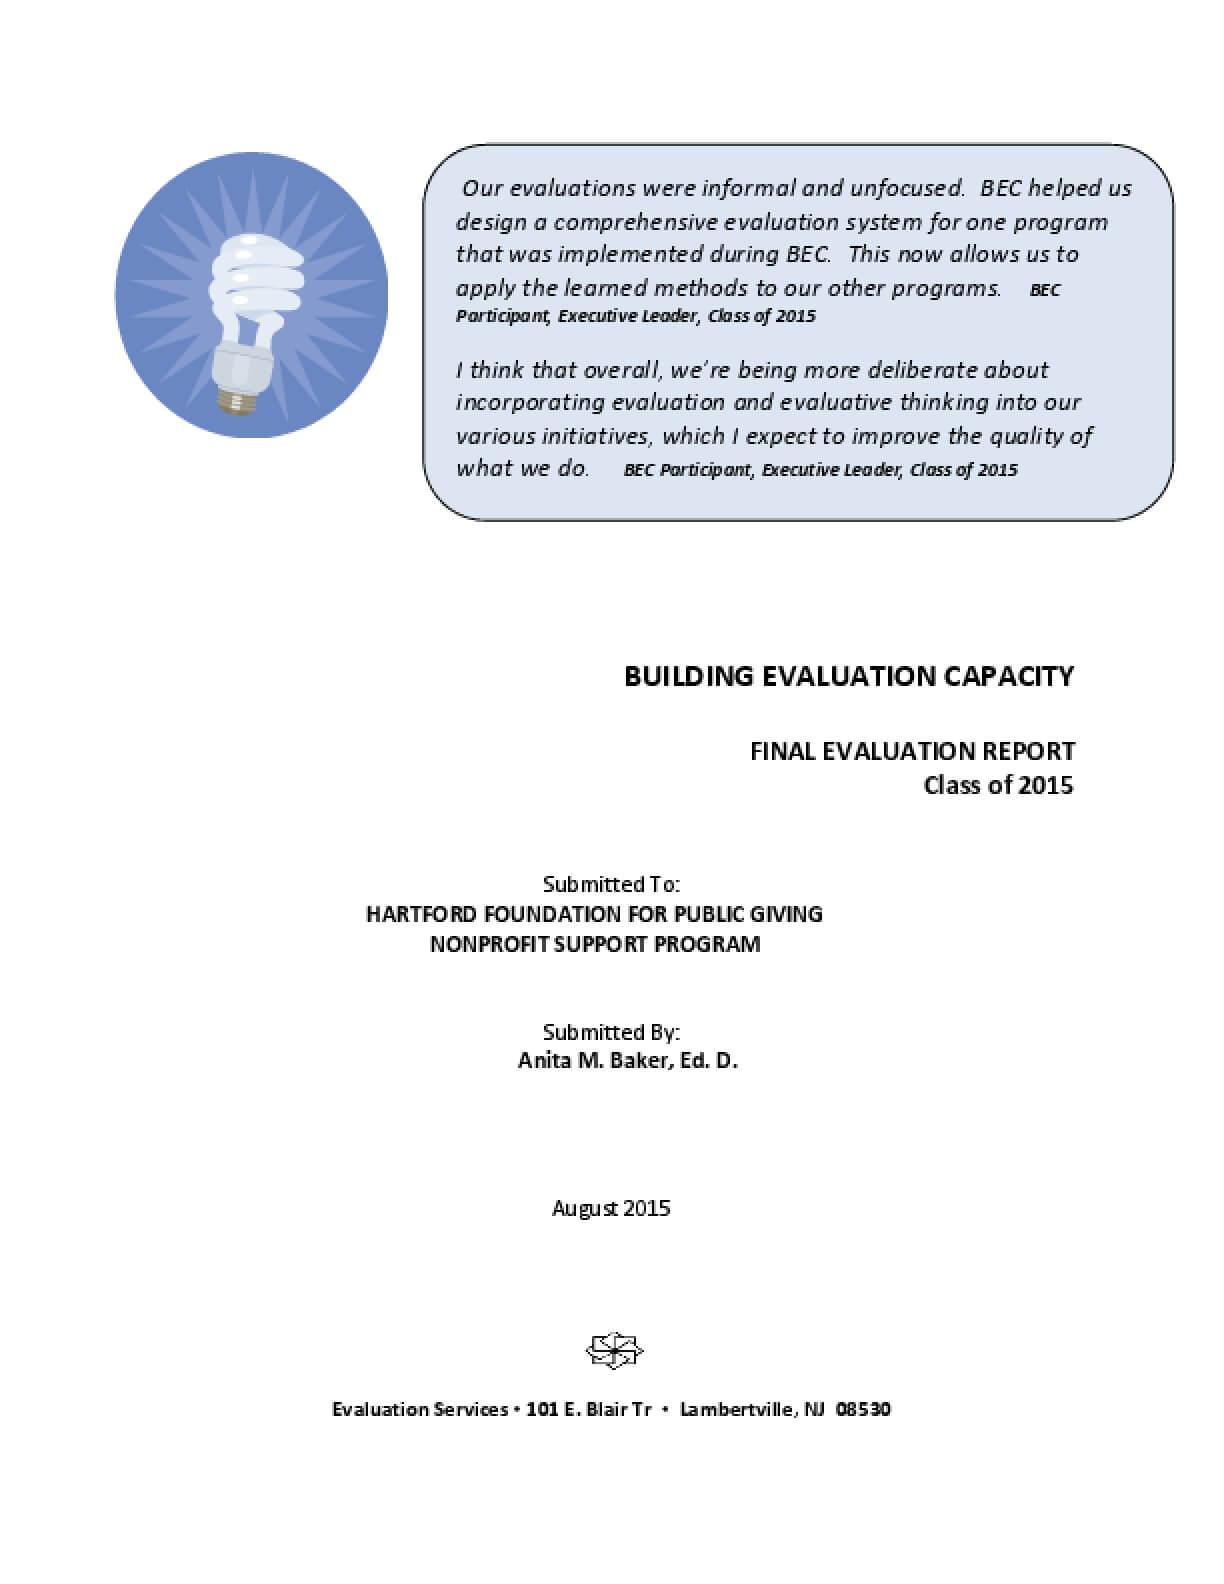 Building Evaluation Capacity Program